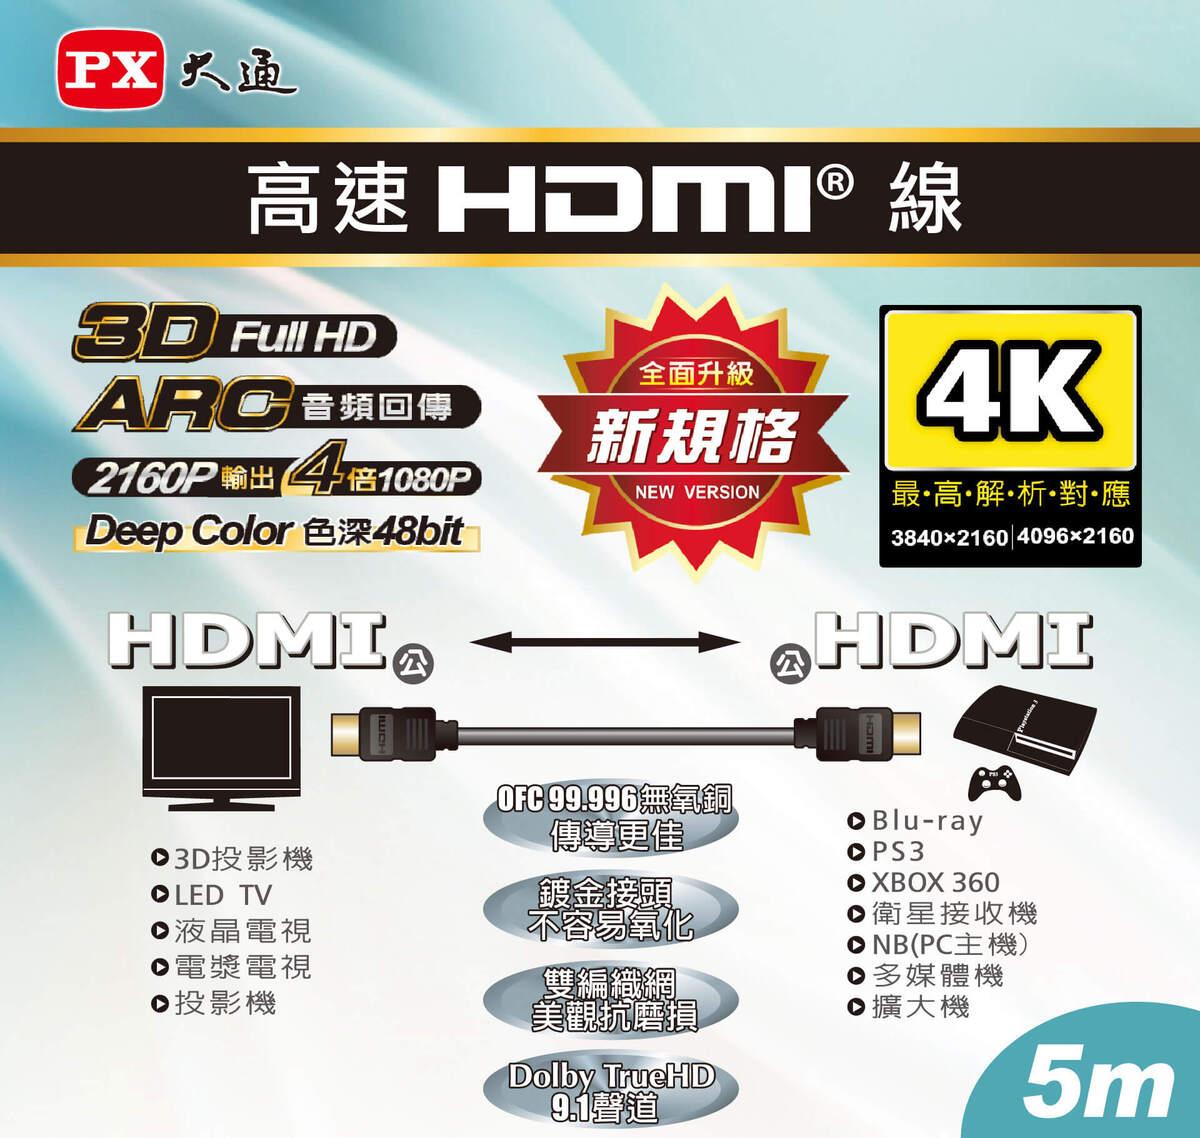 proimages/product/pro-02/pro02-001/HDMI-5MM/HDMI-5MM-3.jpg